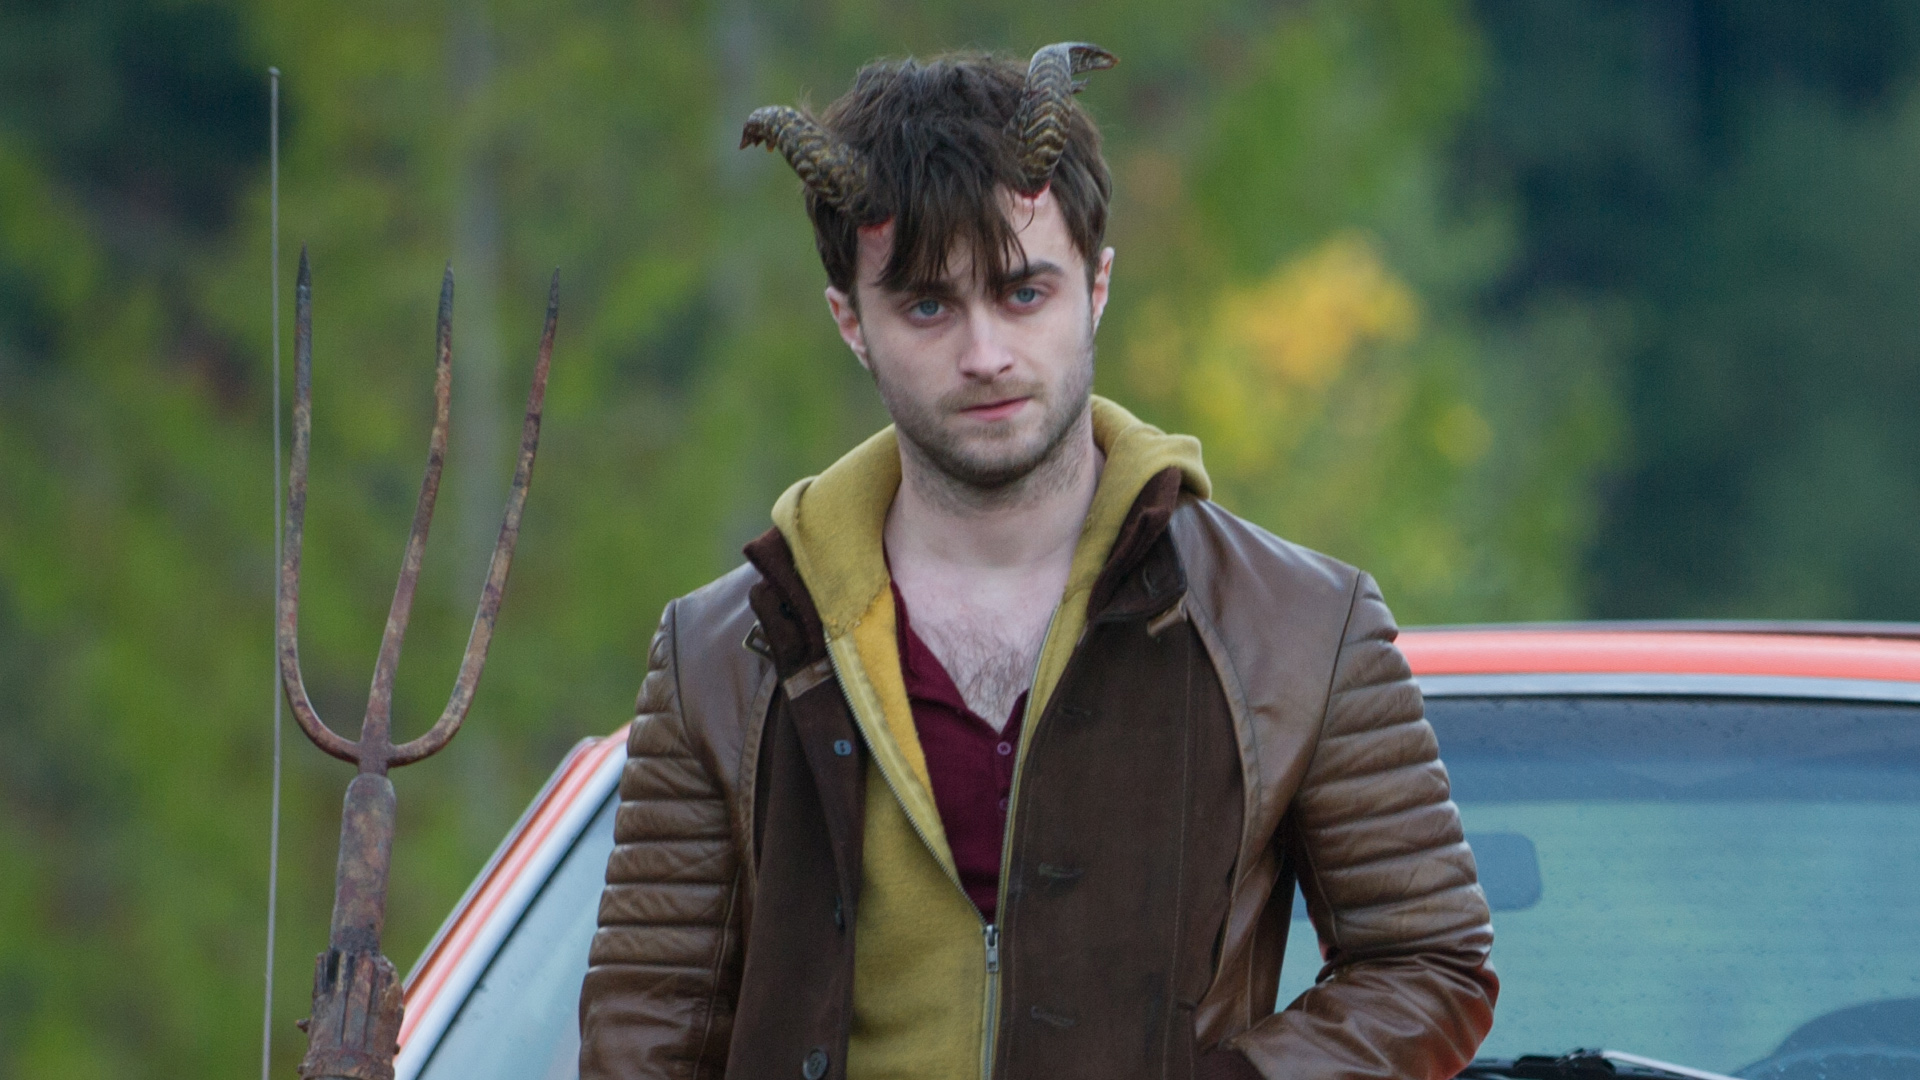 Daniel Radcliffe develops a set of Horns (2013)